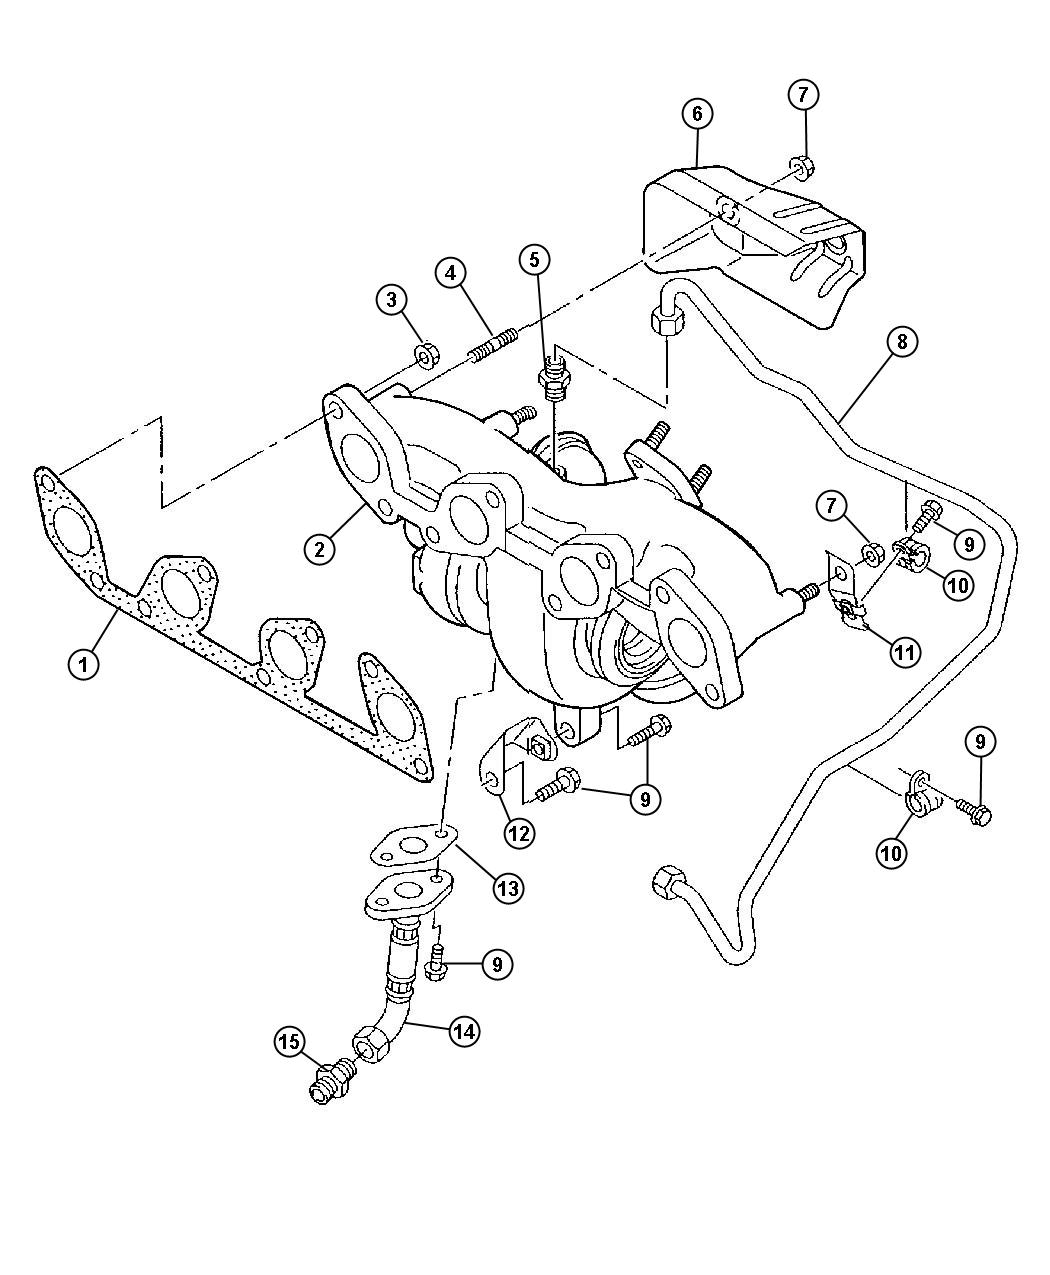 2008 Jeep Patriot Shield. Exhaust manifold, heat